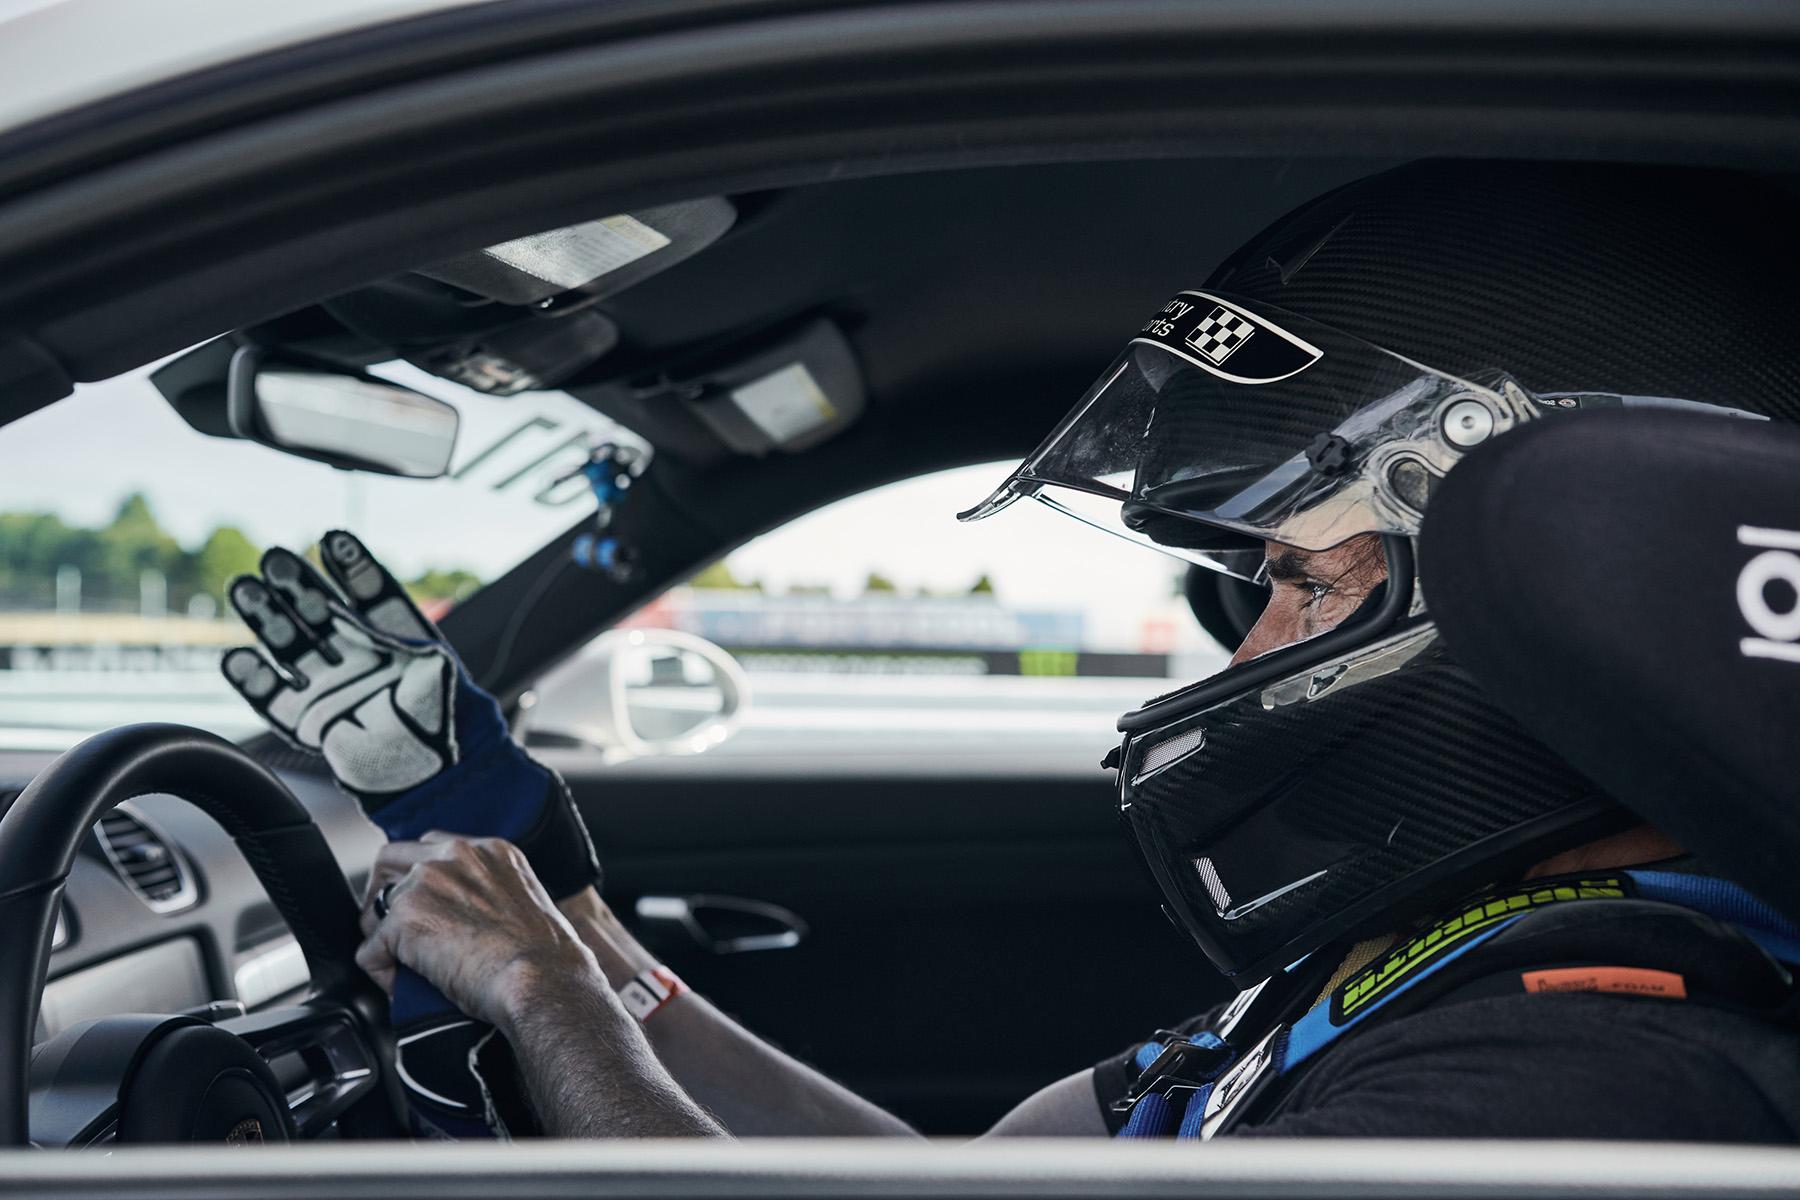 Porsche 718 Cayman S with APEX Wheels at Sonoma Raceway